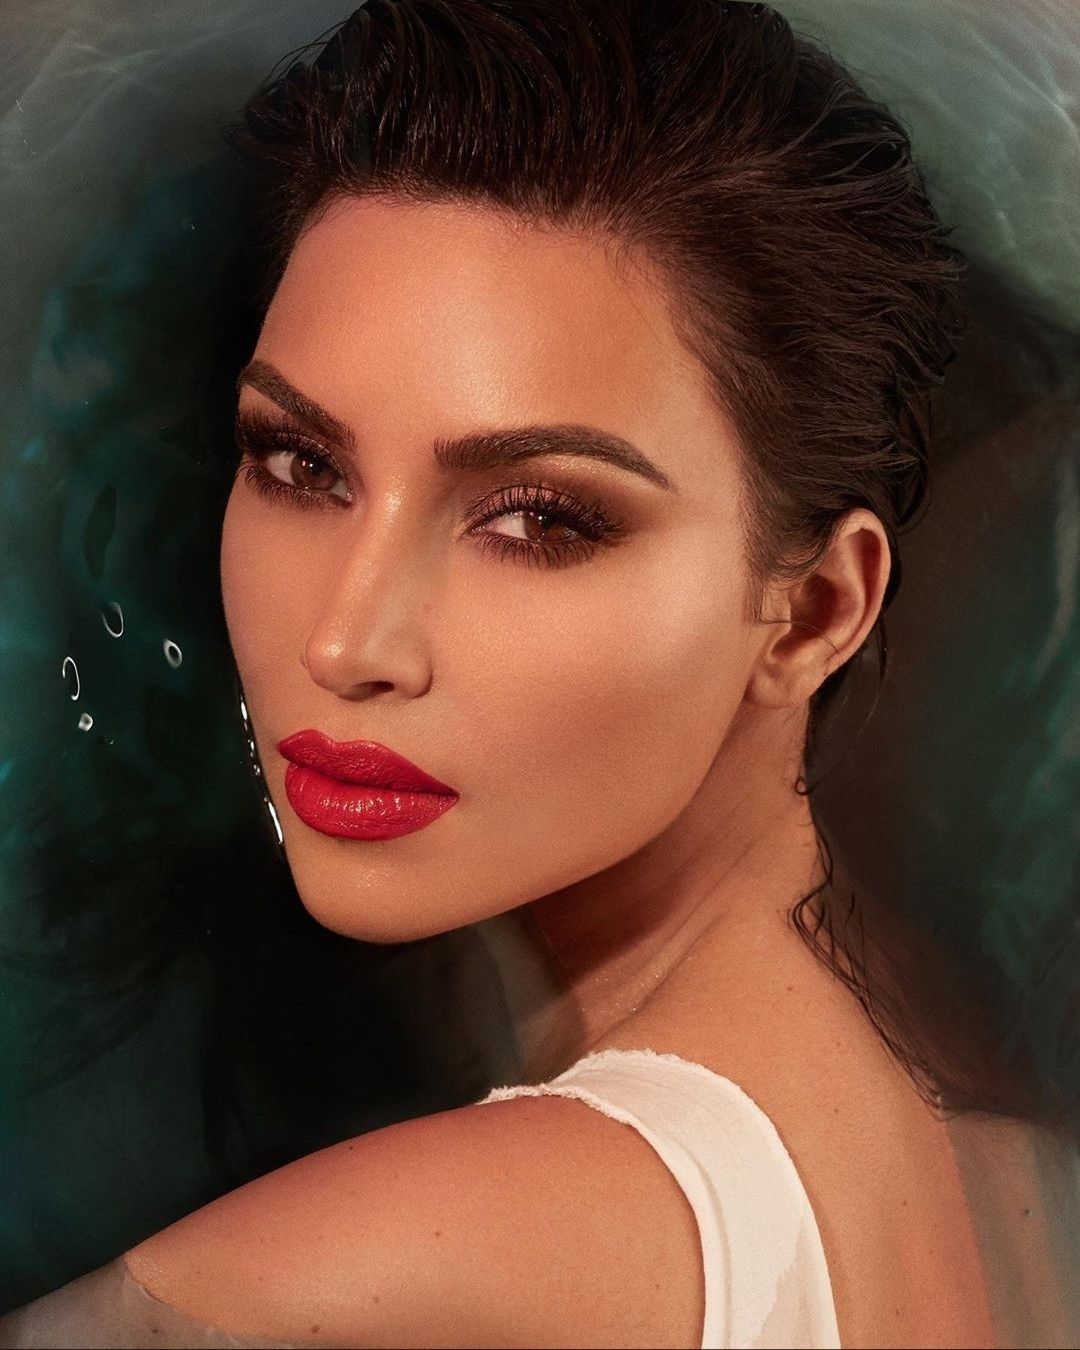 89.3 mil Me gusta, 793 comentarios - Kim Kardashian West